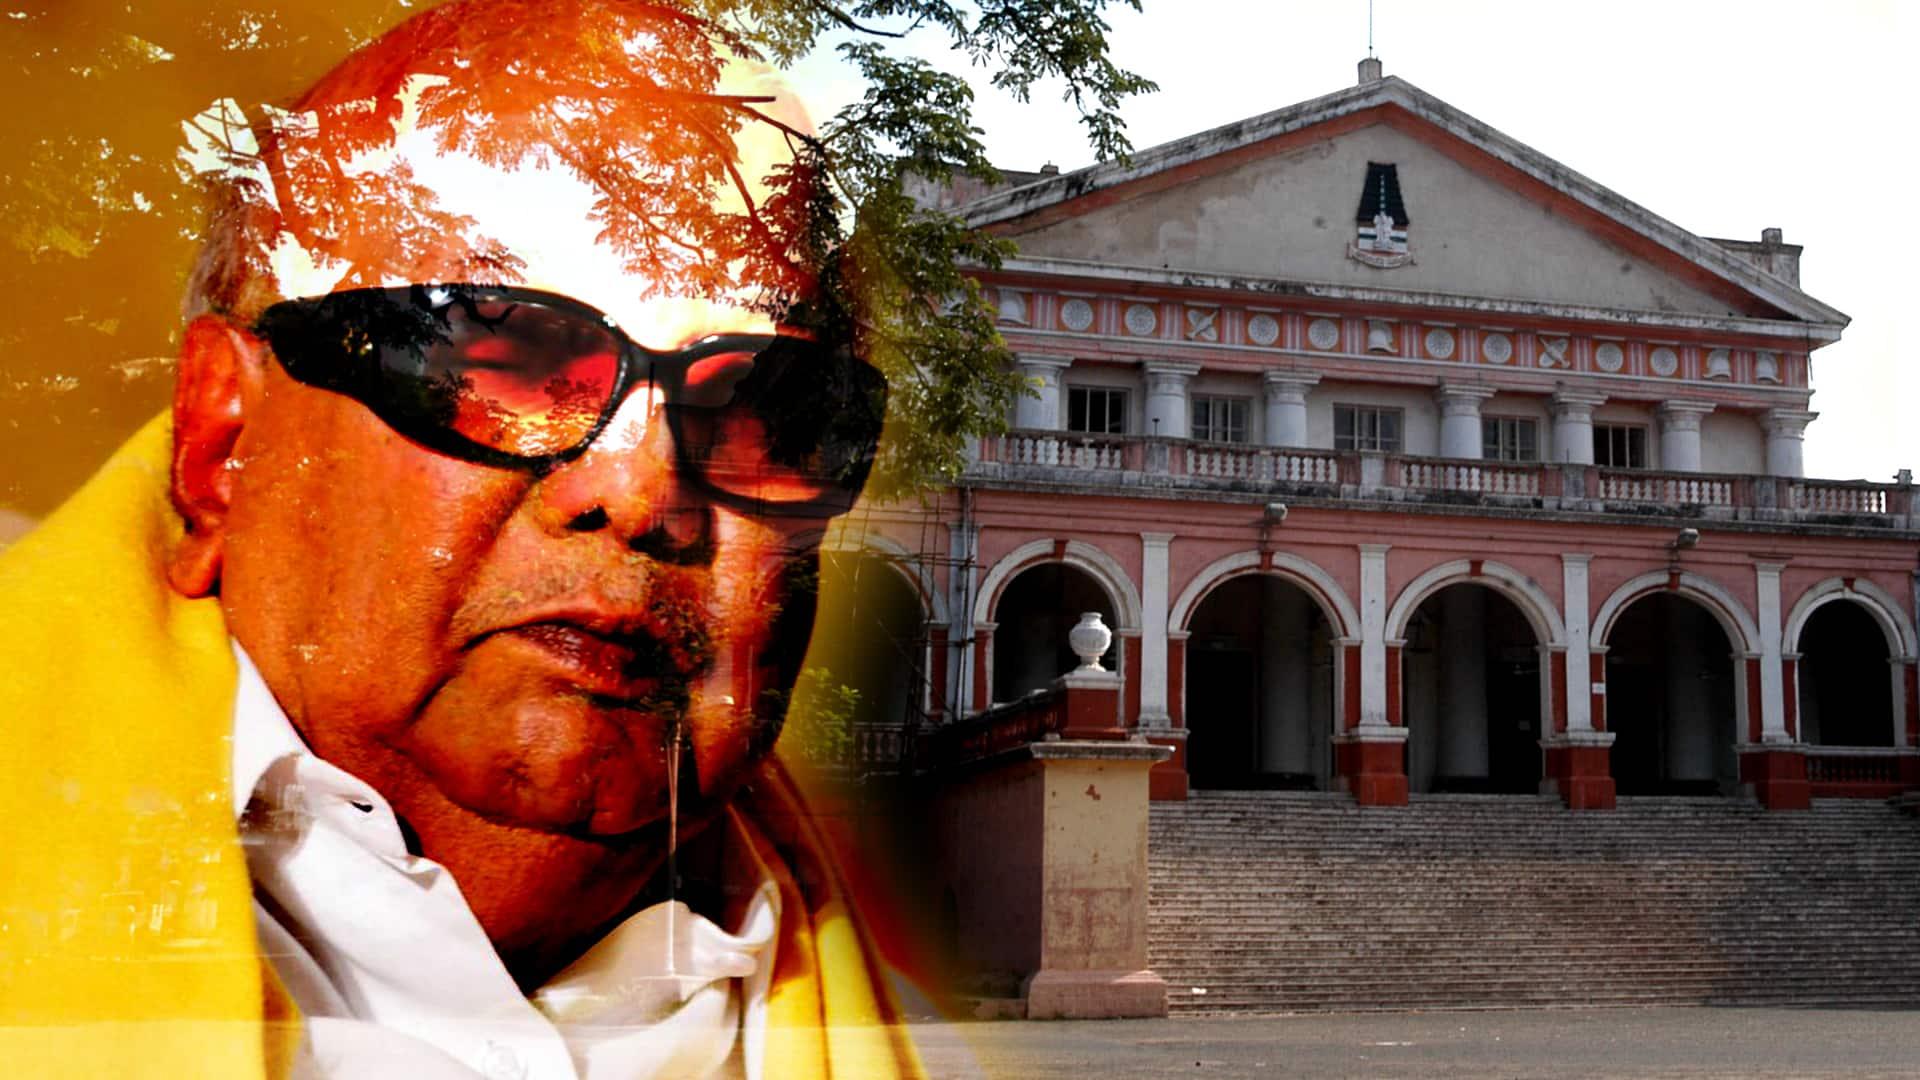 No official word on Karunanidhi, but Rajaji Hall and Anna memorial sees action